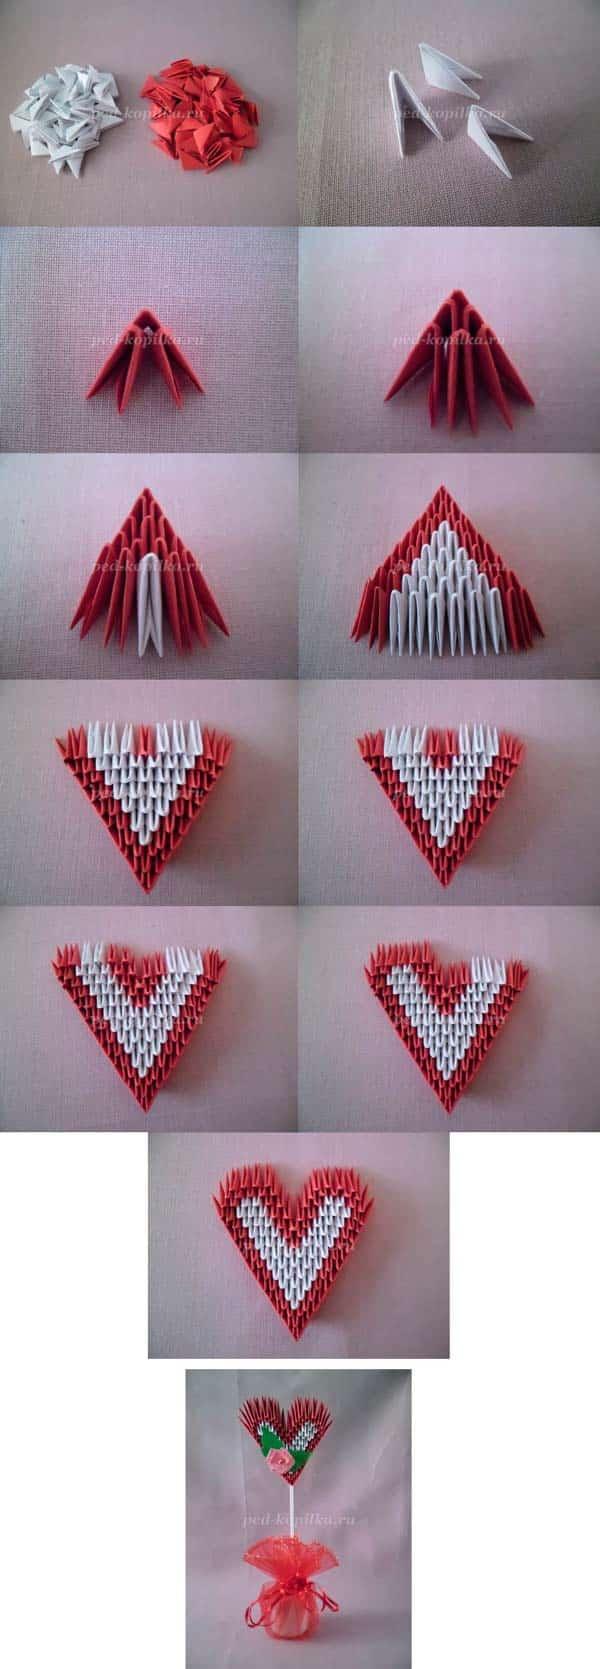 Модульное сердце пошагово